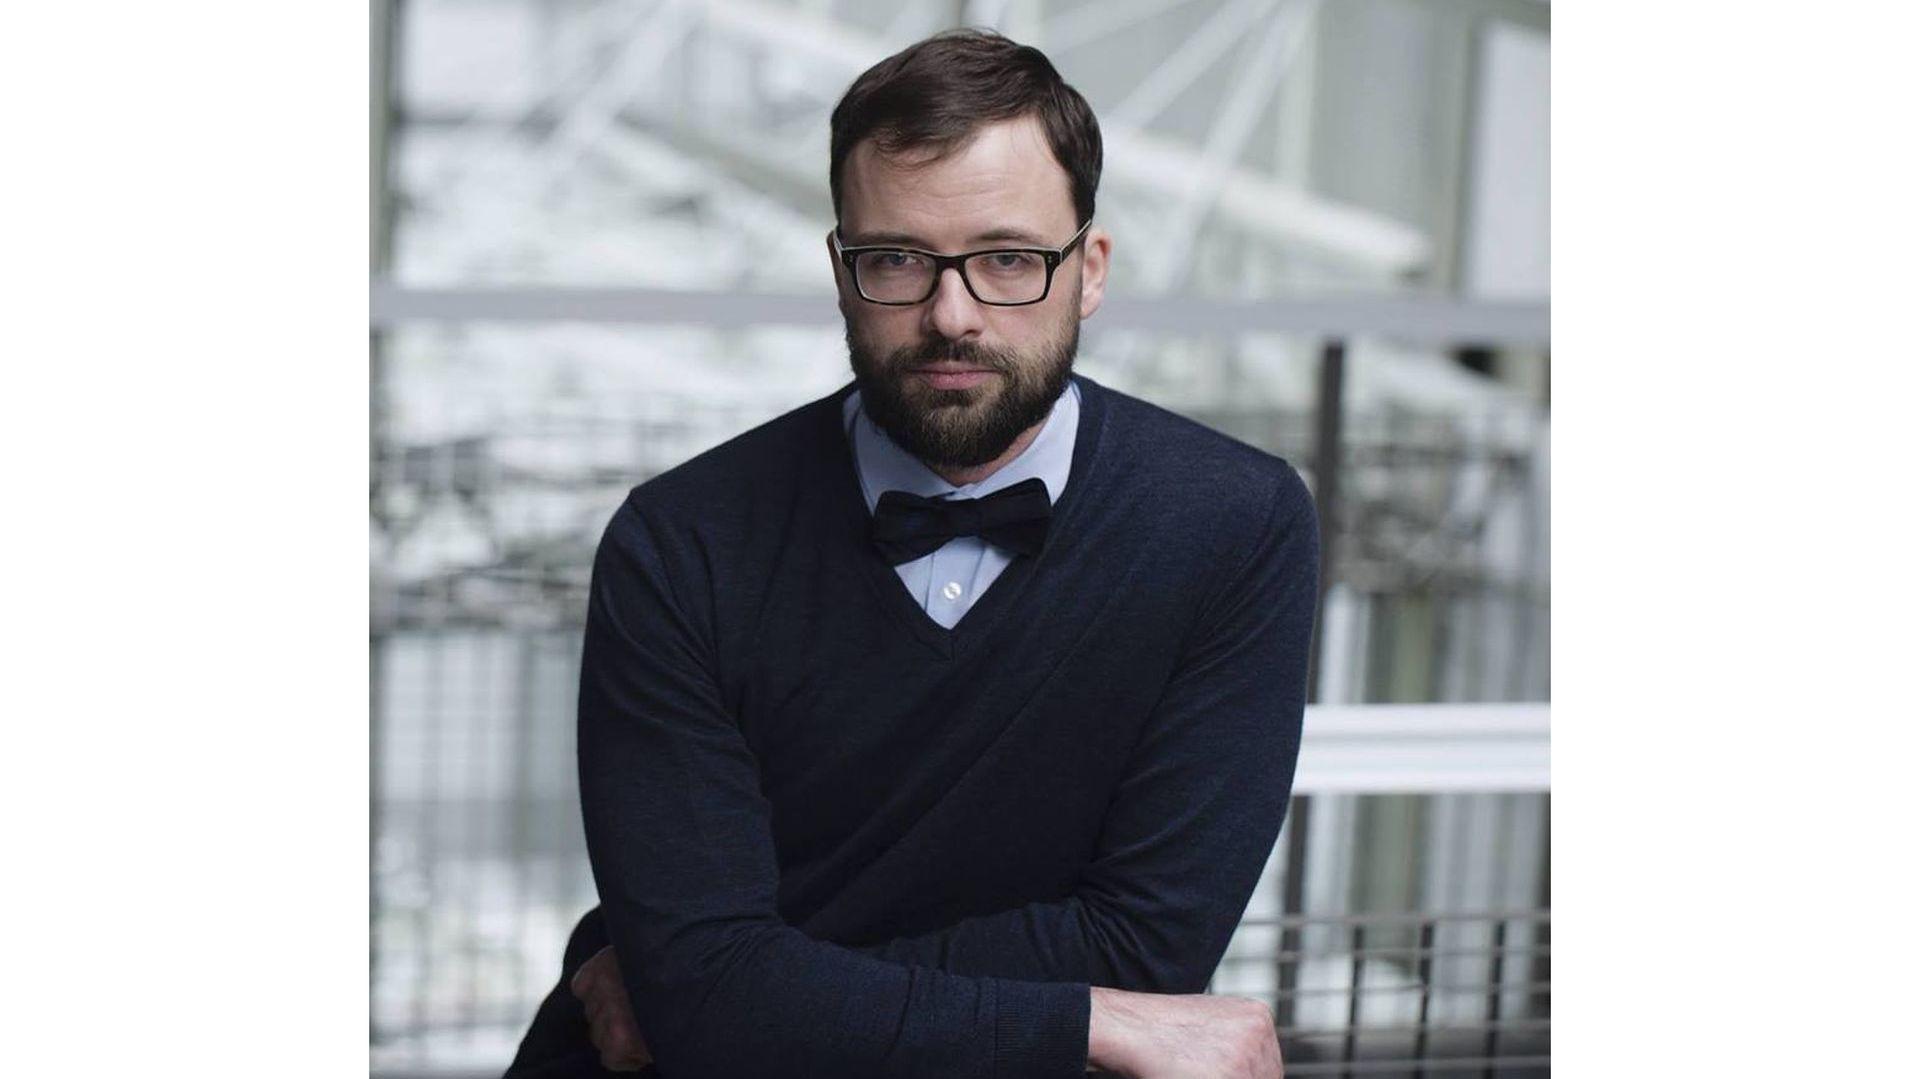 Szymon Pietkiewicz, CMO & Managing Partner, Tower Group Communications